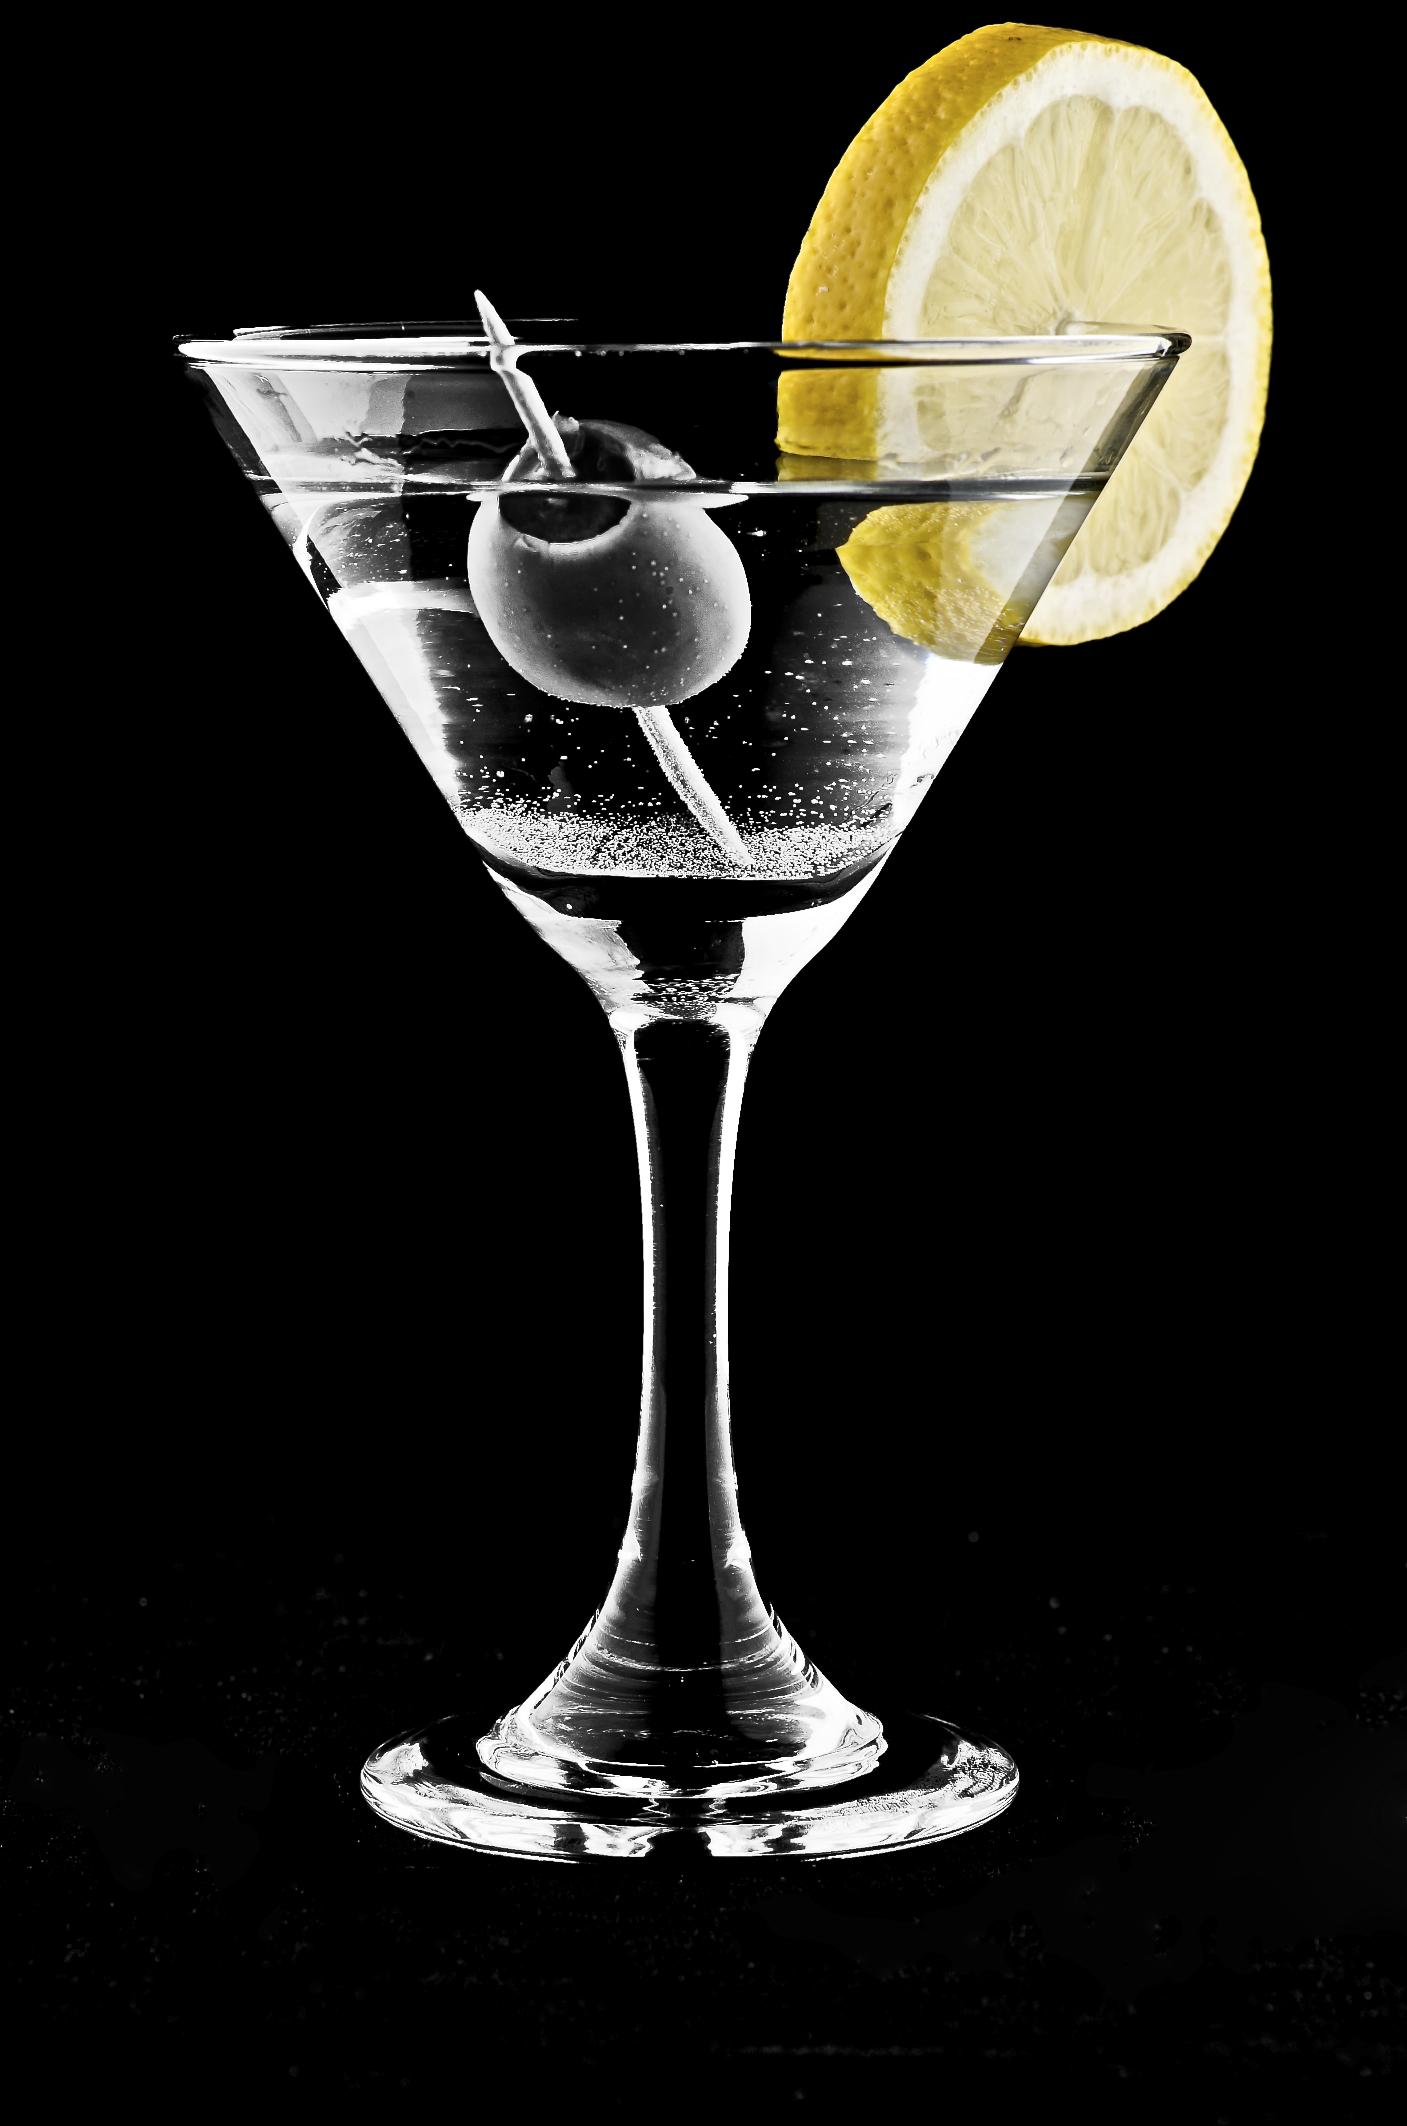 Google images for Vodka martini